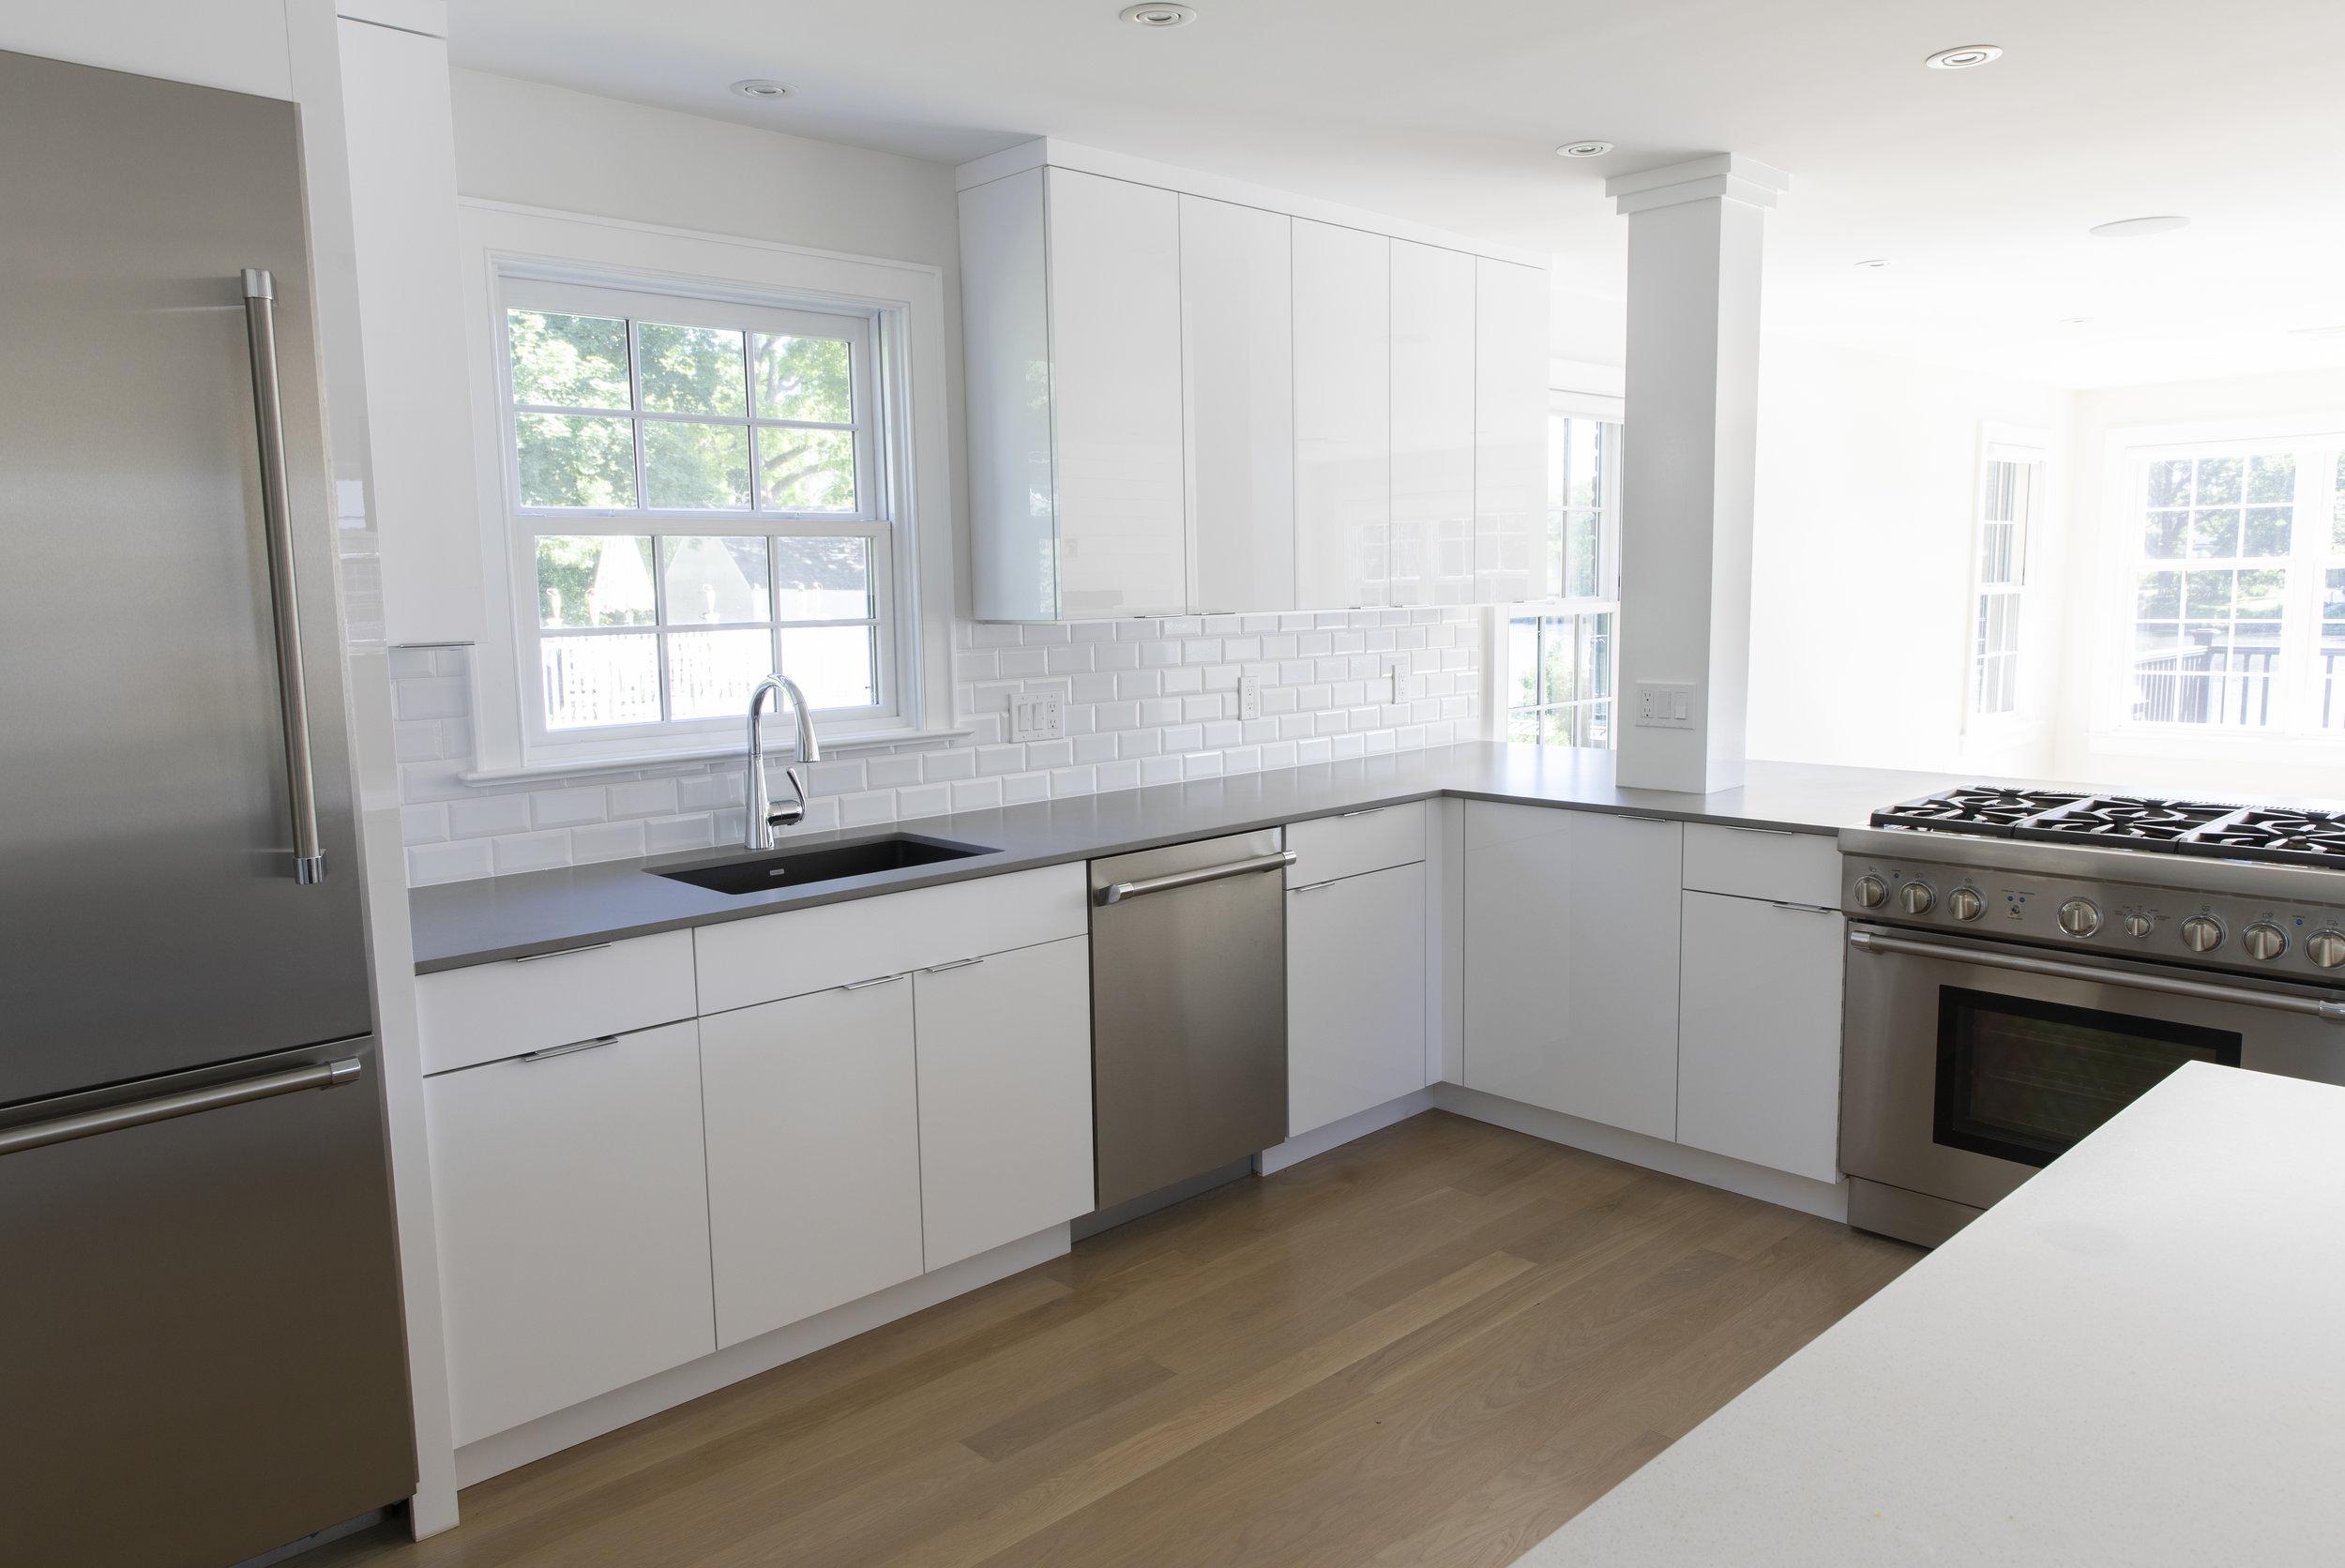 38 kitchen angle 2.jpg